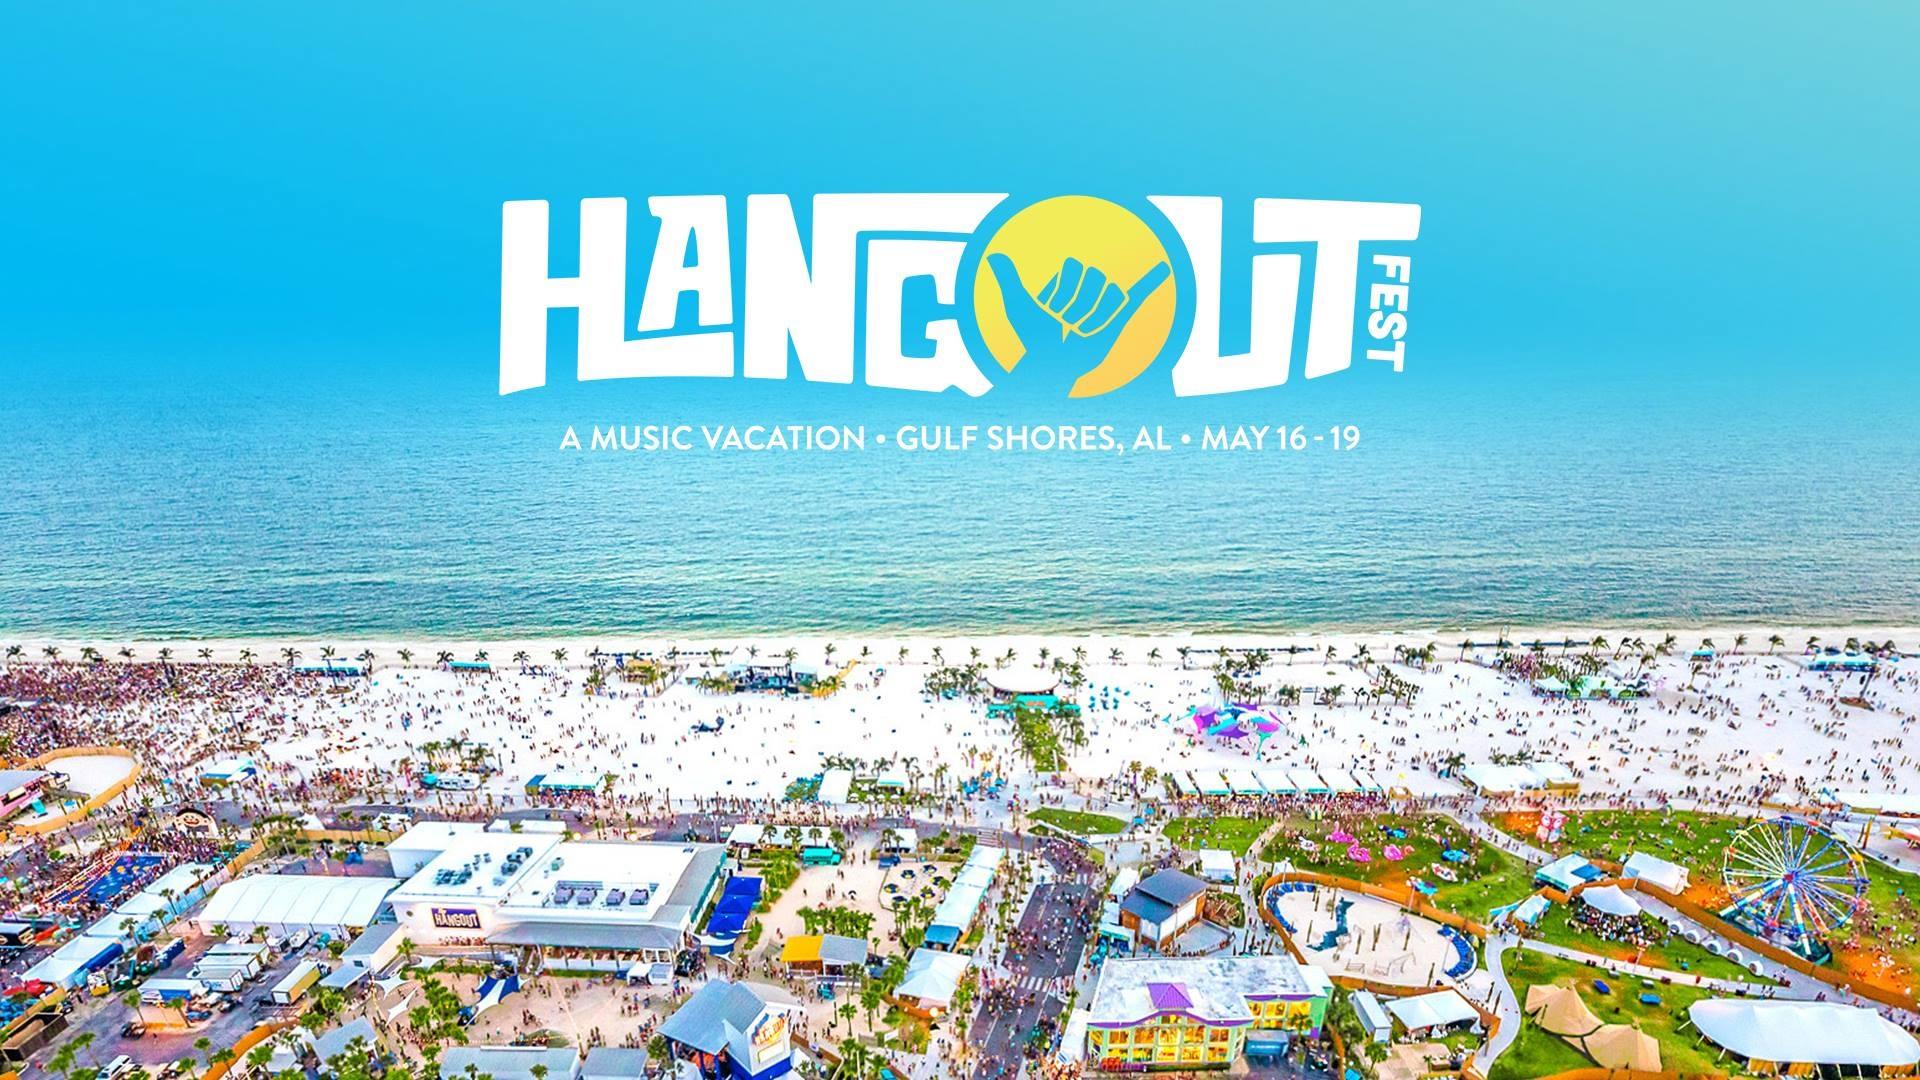 hangout music festival confirms 2019 lineup pearl jam logo image pearl jam logo font